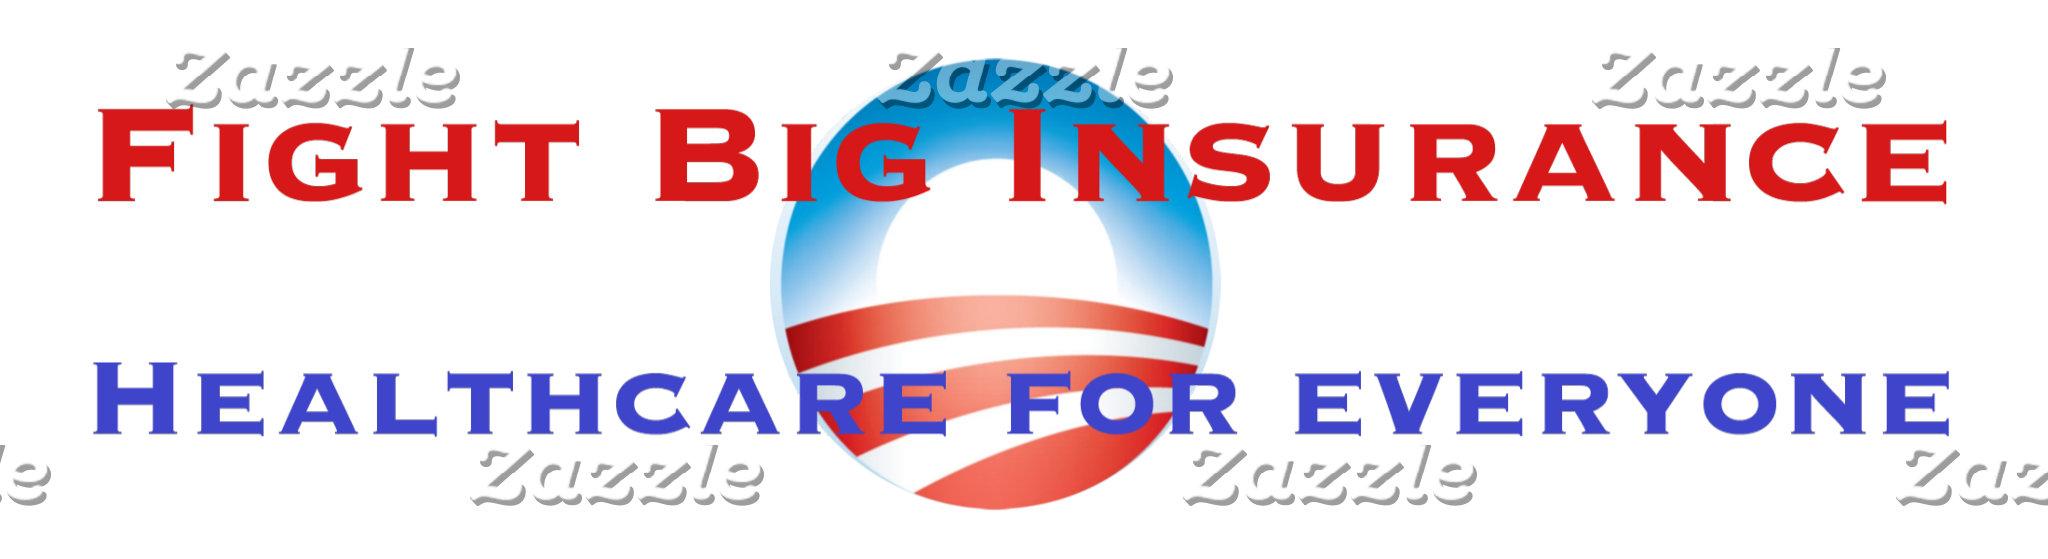 Healthcare now!